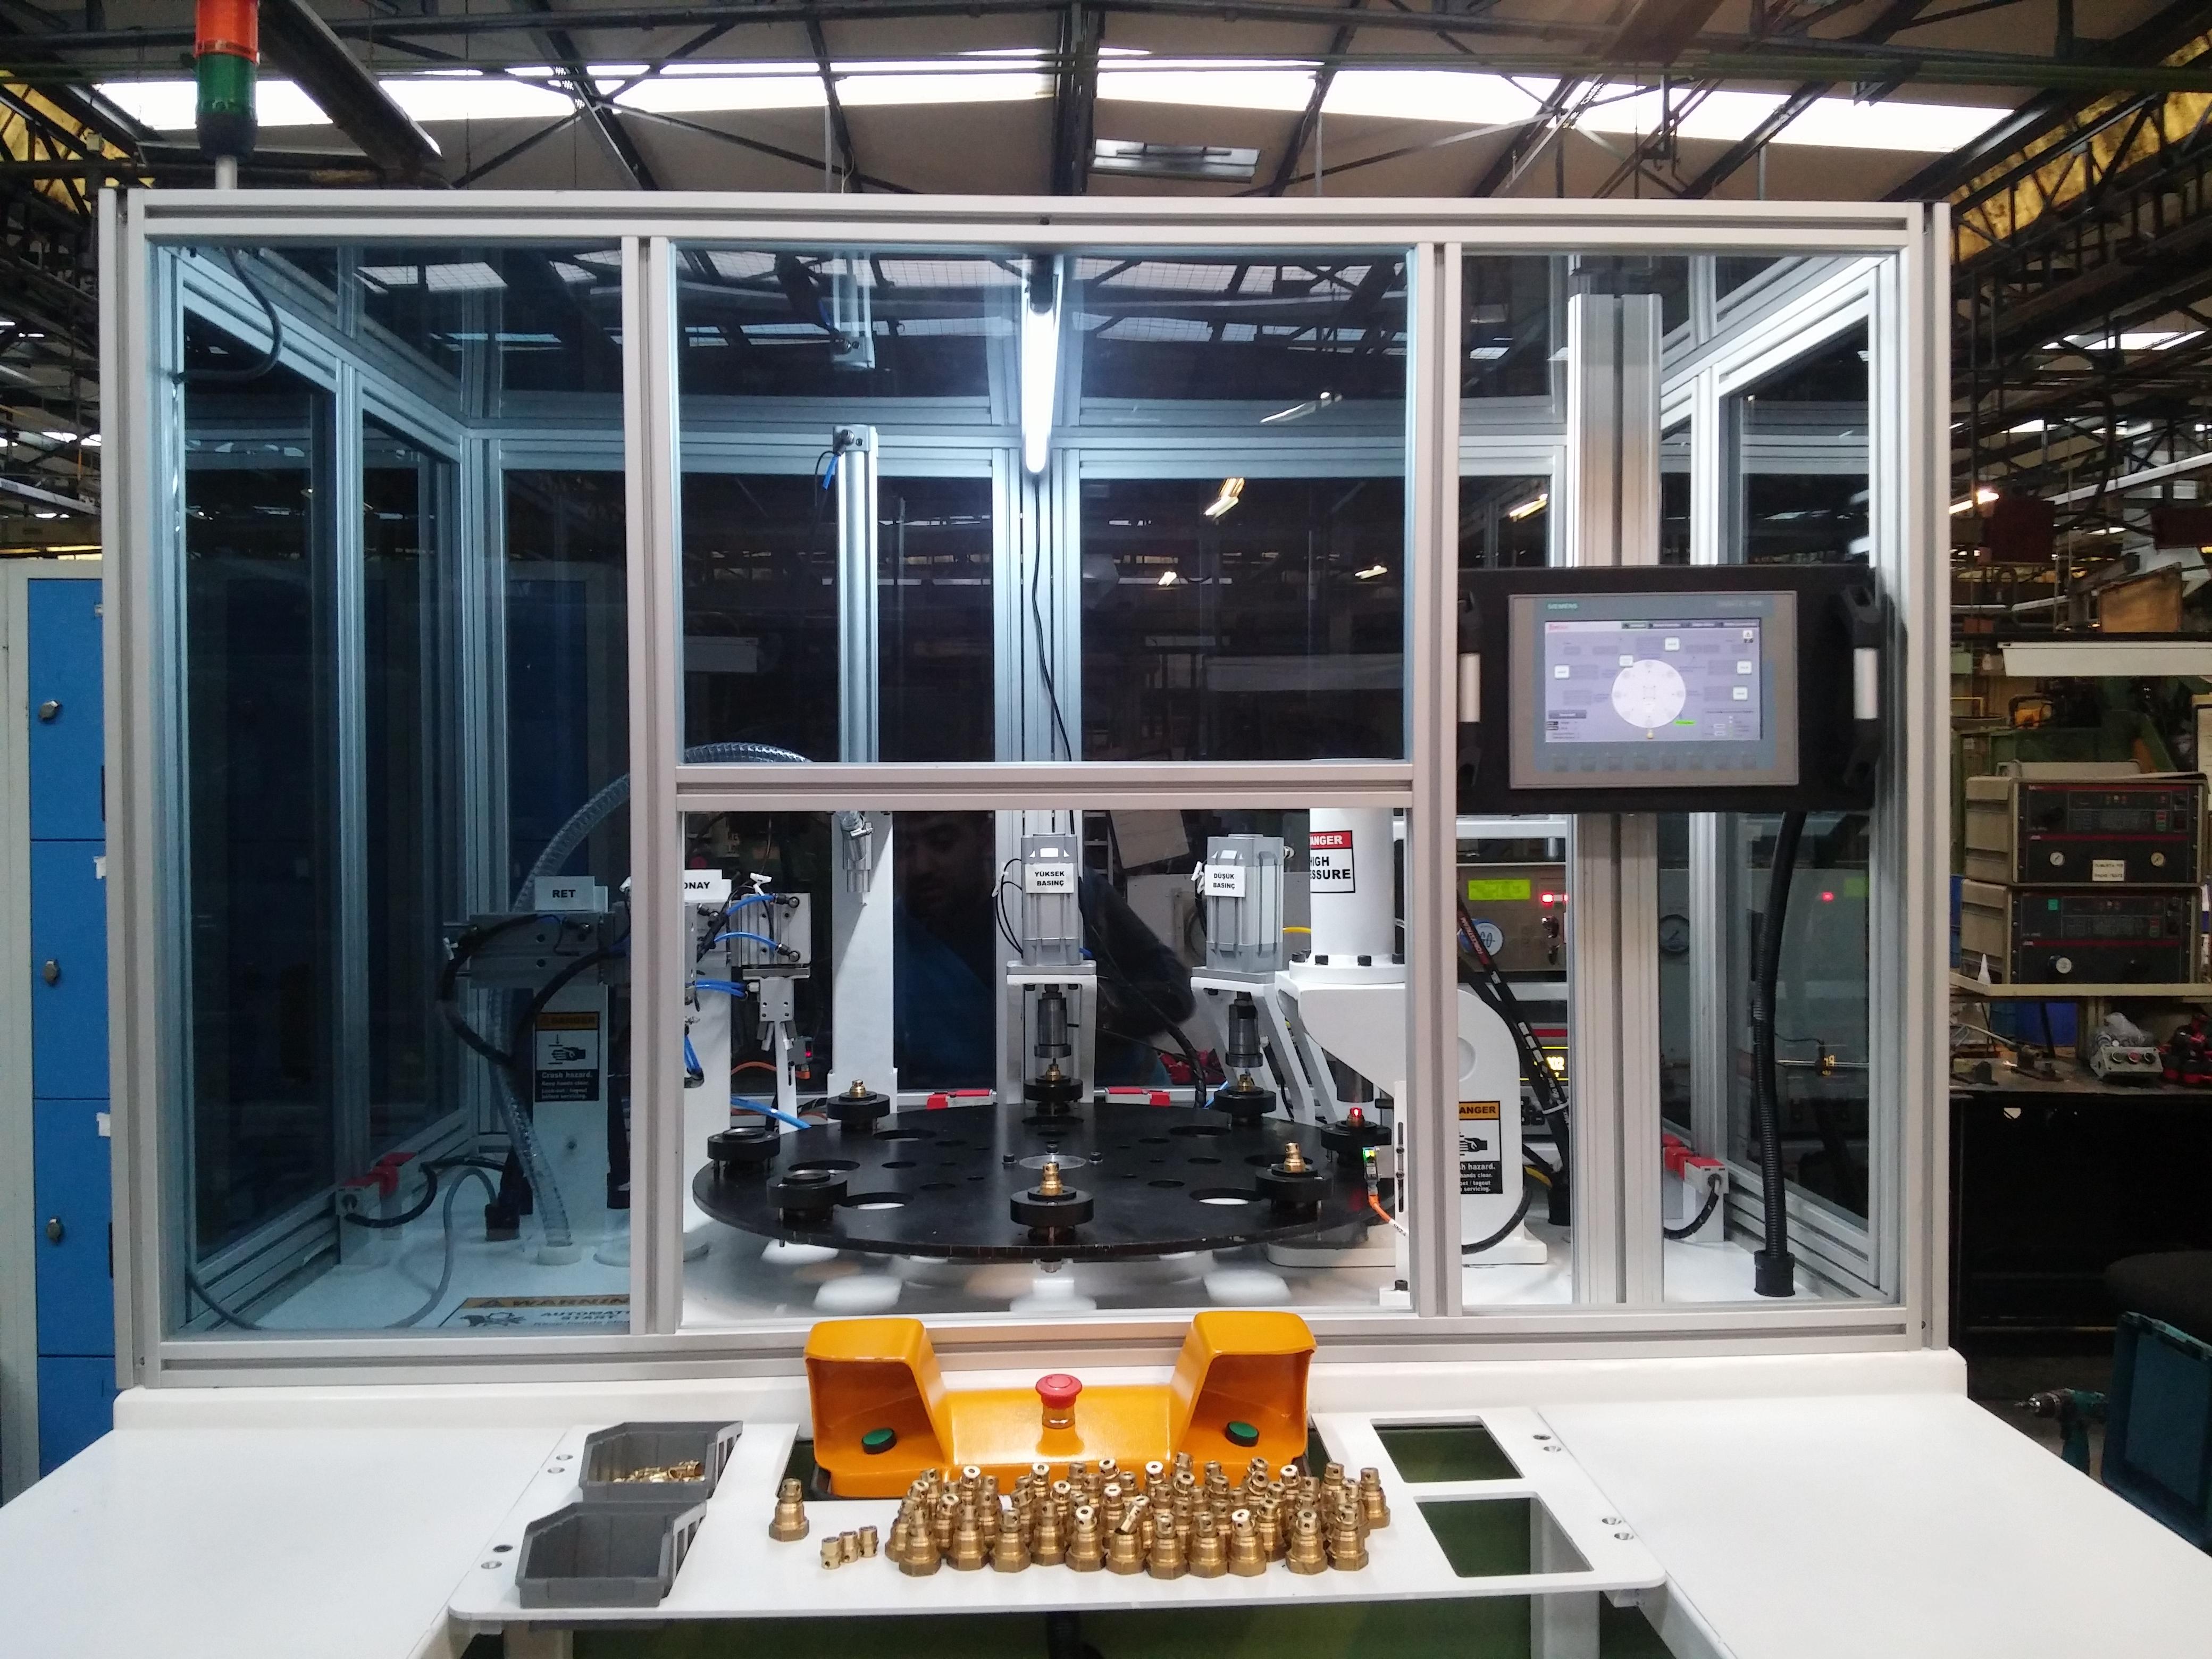 Otomatik Montaj Makineleri